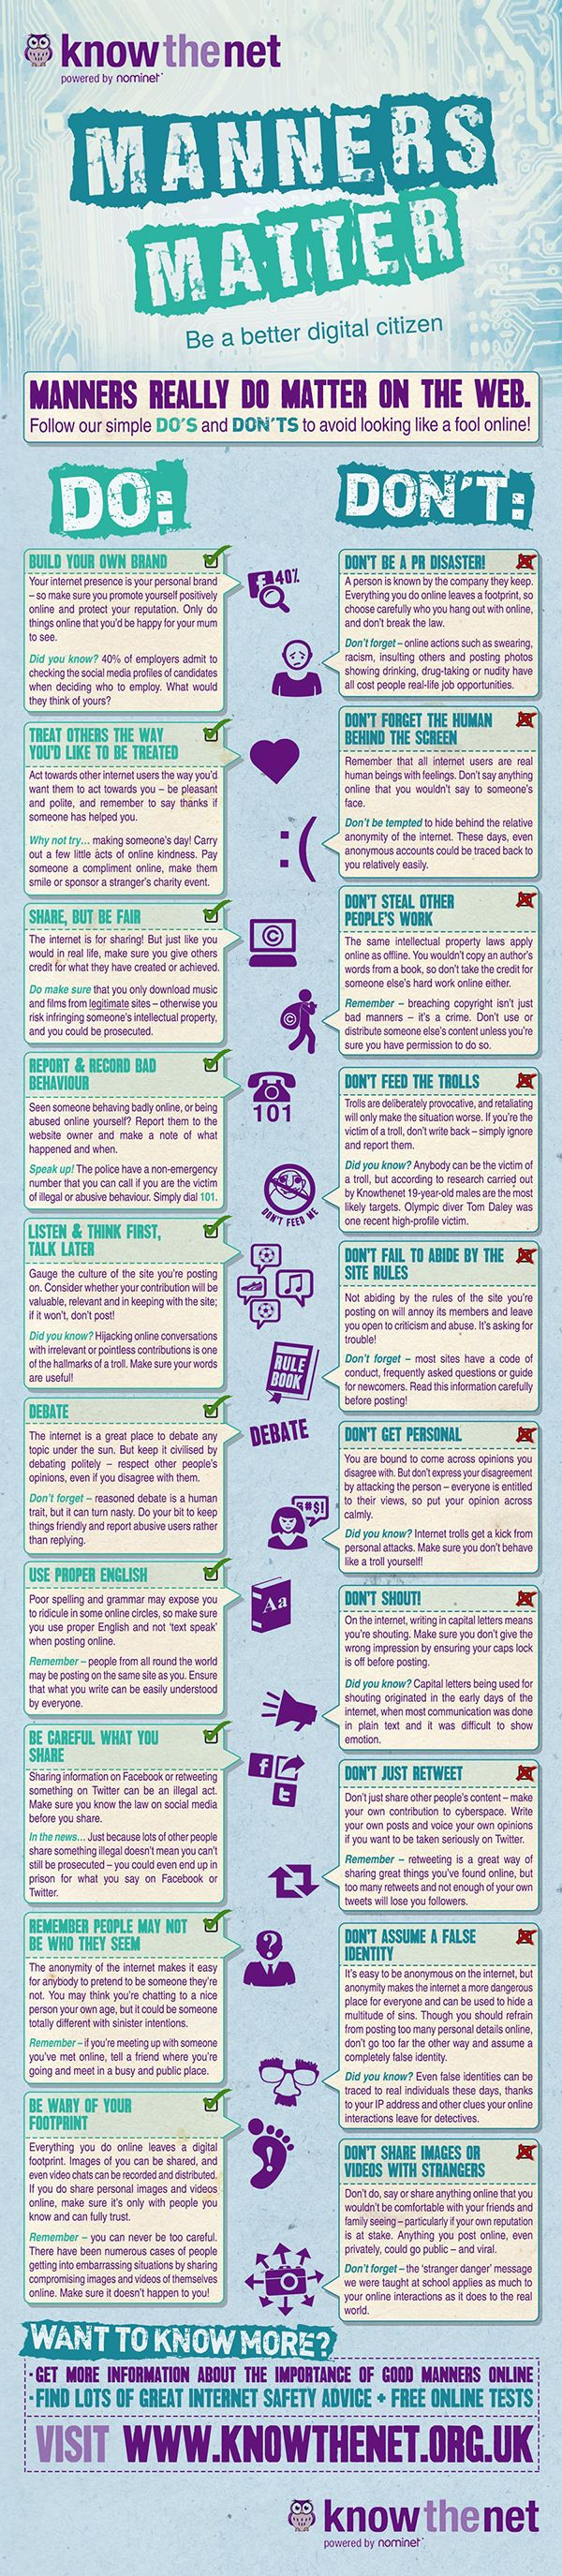 netiquette infographic